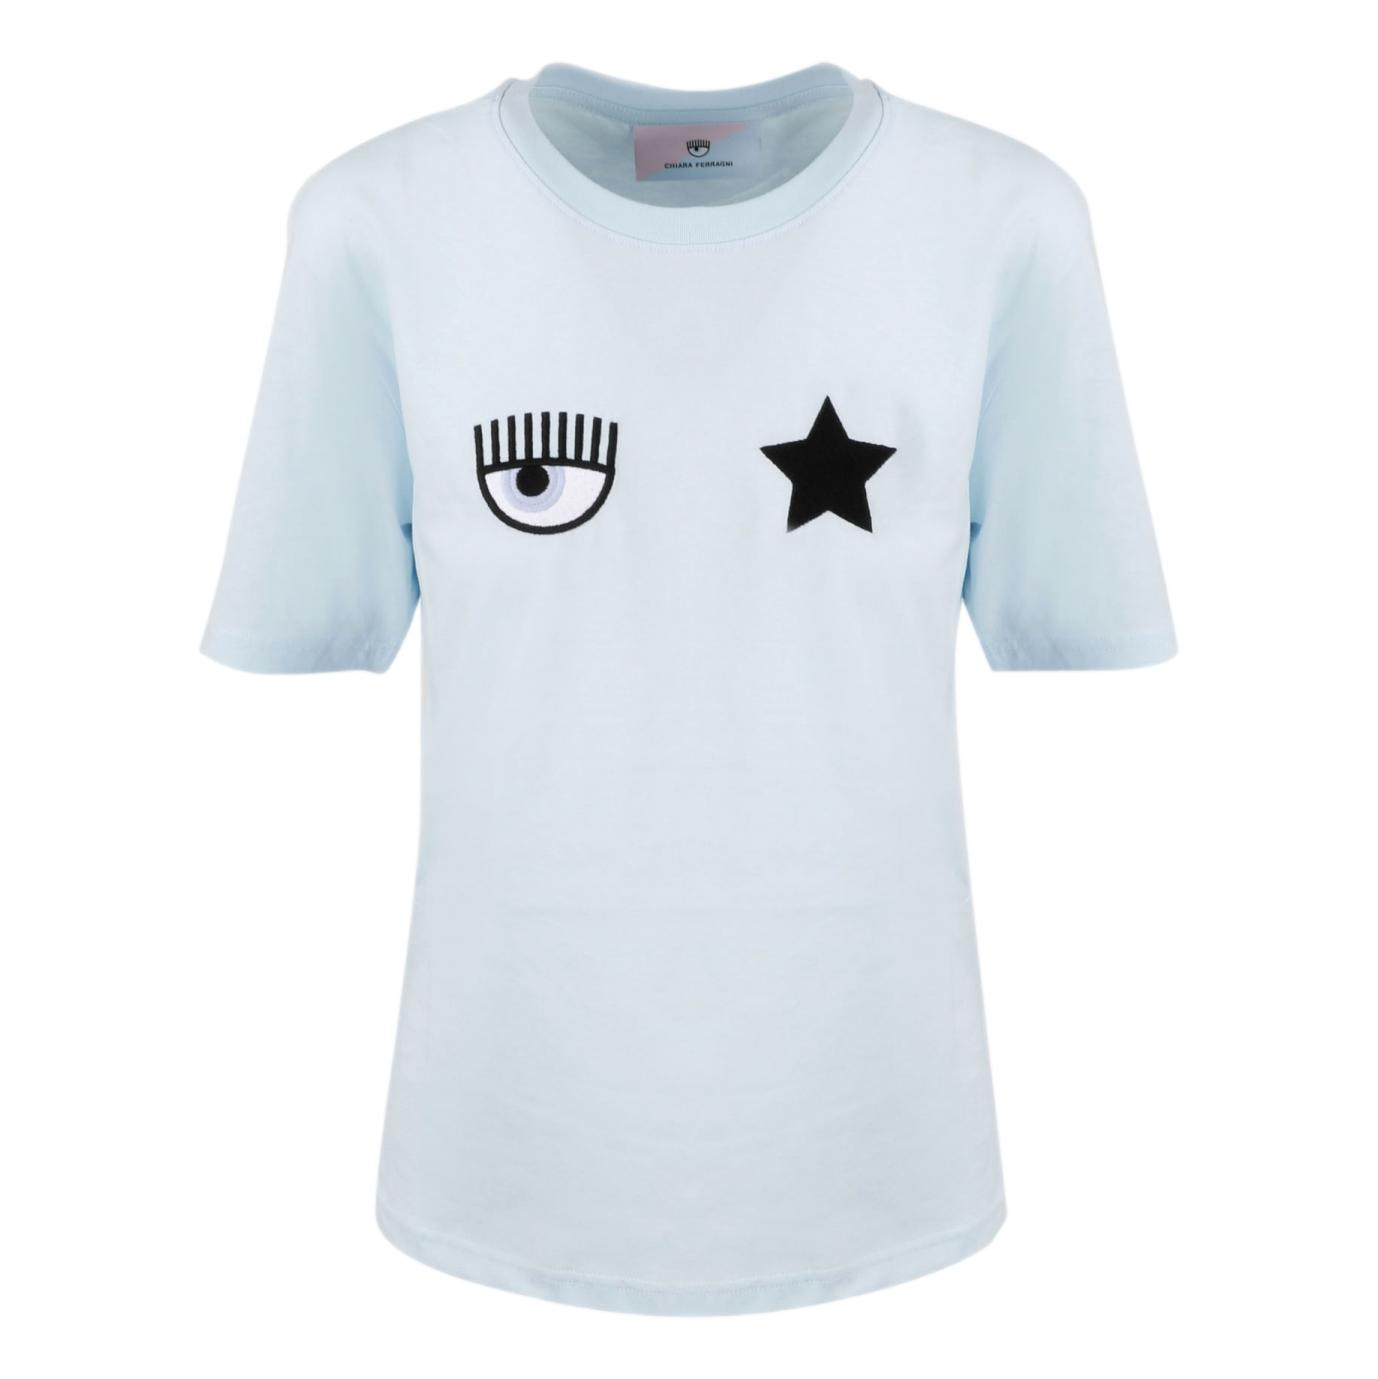 T-shirt con ricamo CHIARA FERRAGNI | T-shirt | 71CBHT01 CJC0T216